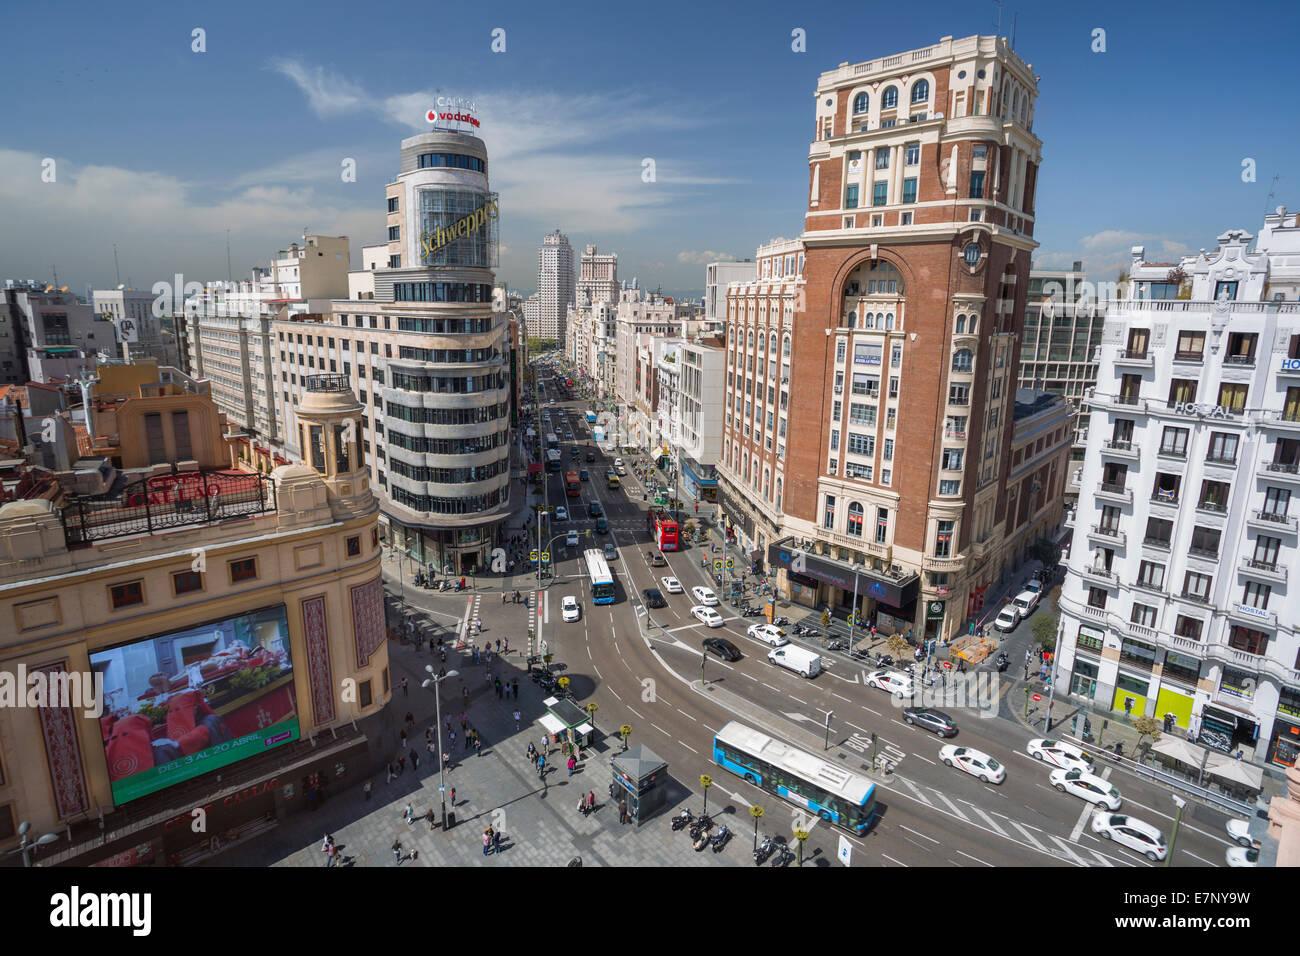 Avenue, Callao, City, Gran Via, Madrid, Spain, Europe, Square, architecture, downtown, modernism, tourism, travel - Stock Image